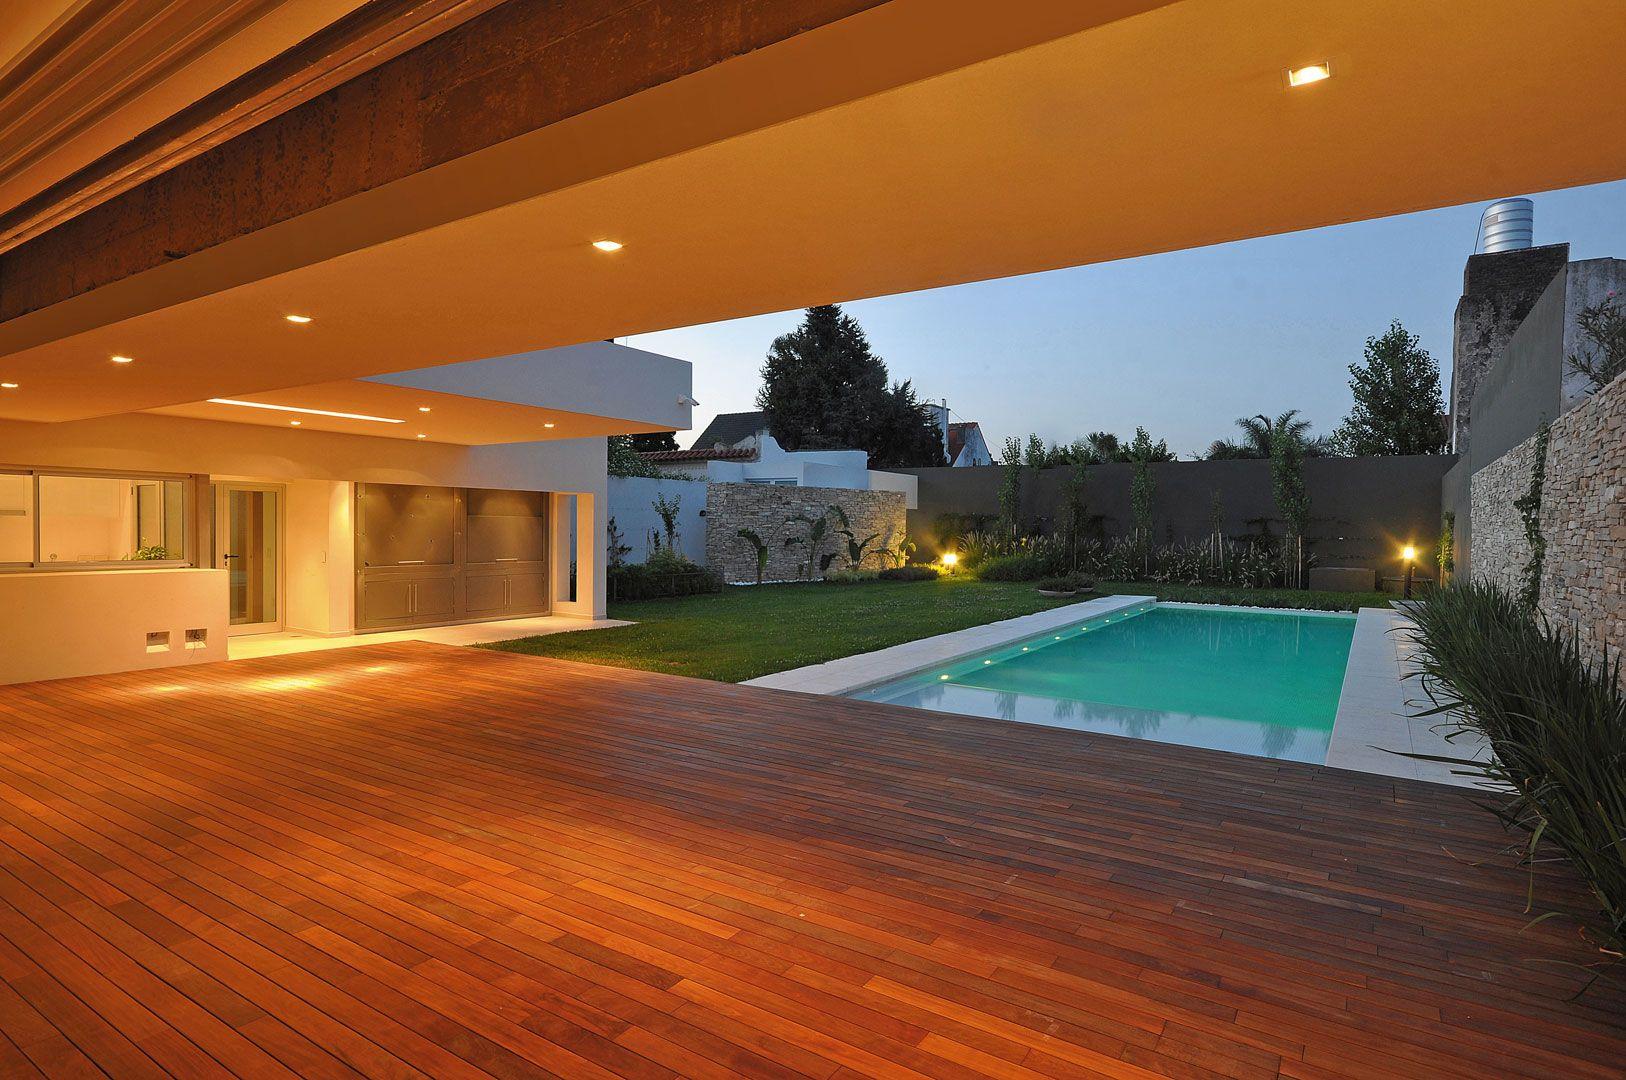 Pavloff Regalini Asociados Estudio De Arquitectura Casa 12